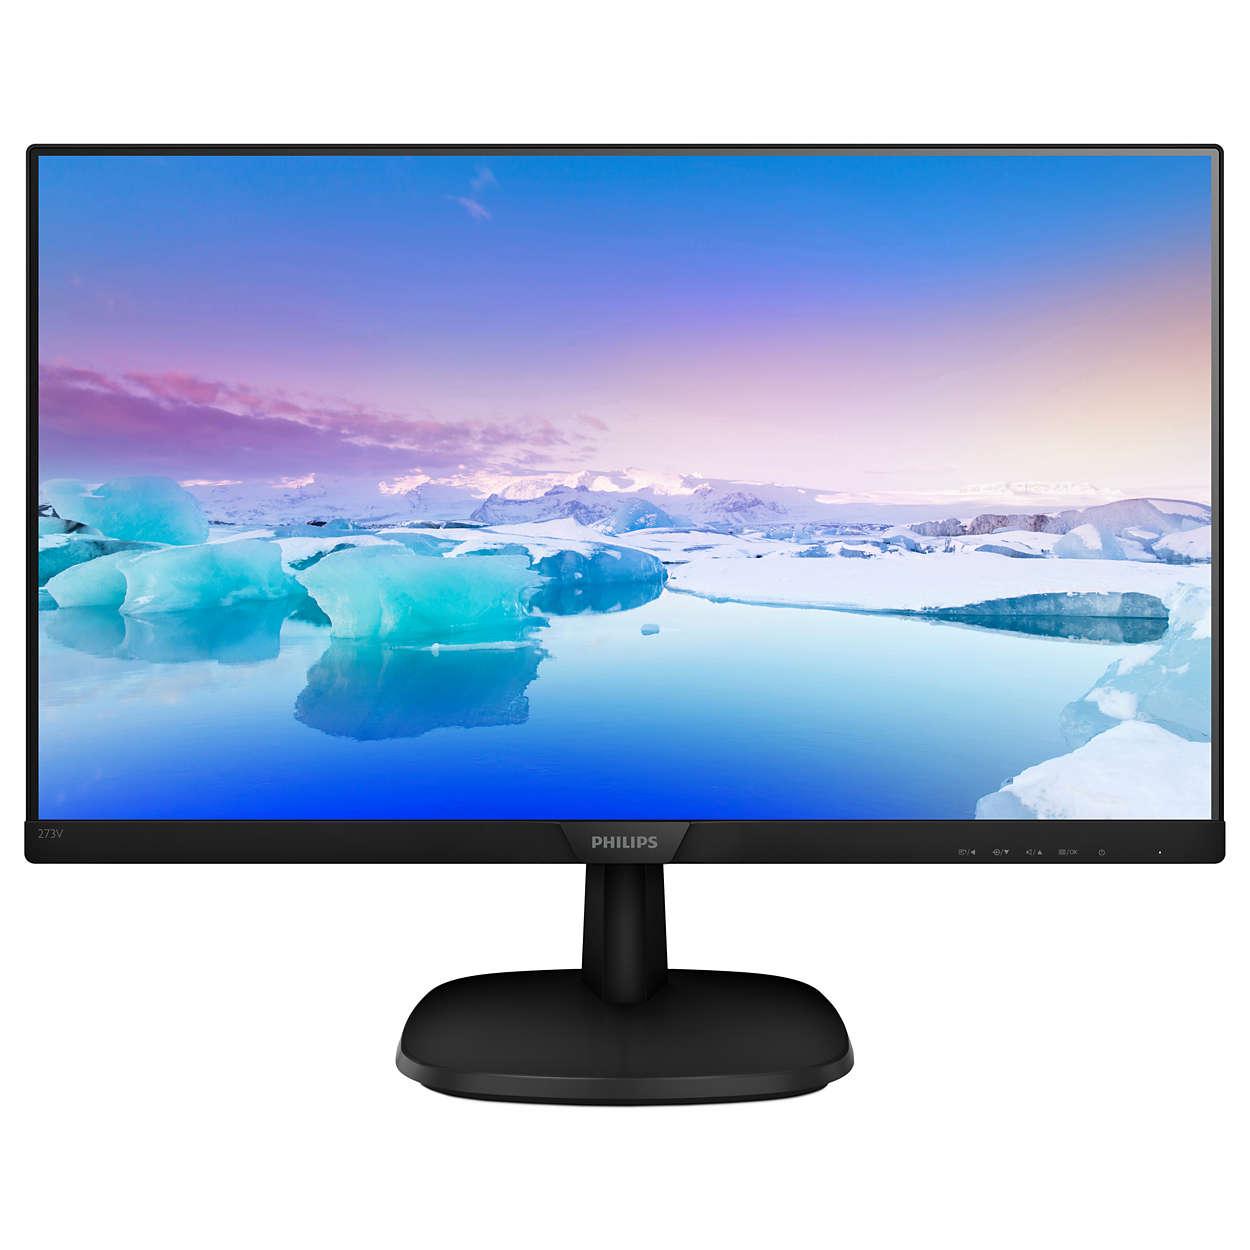 Monitor LED Philips 273V7QJAB/00 27 5ms Full HD Negru